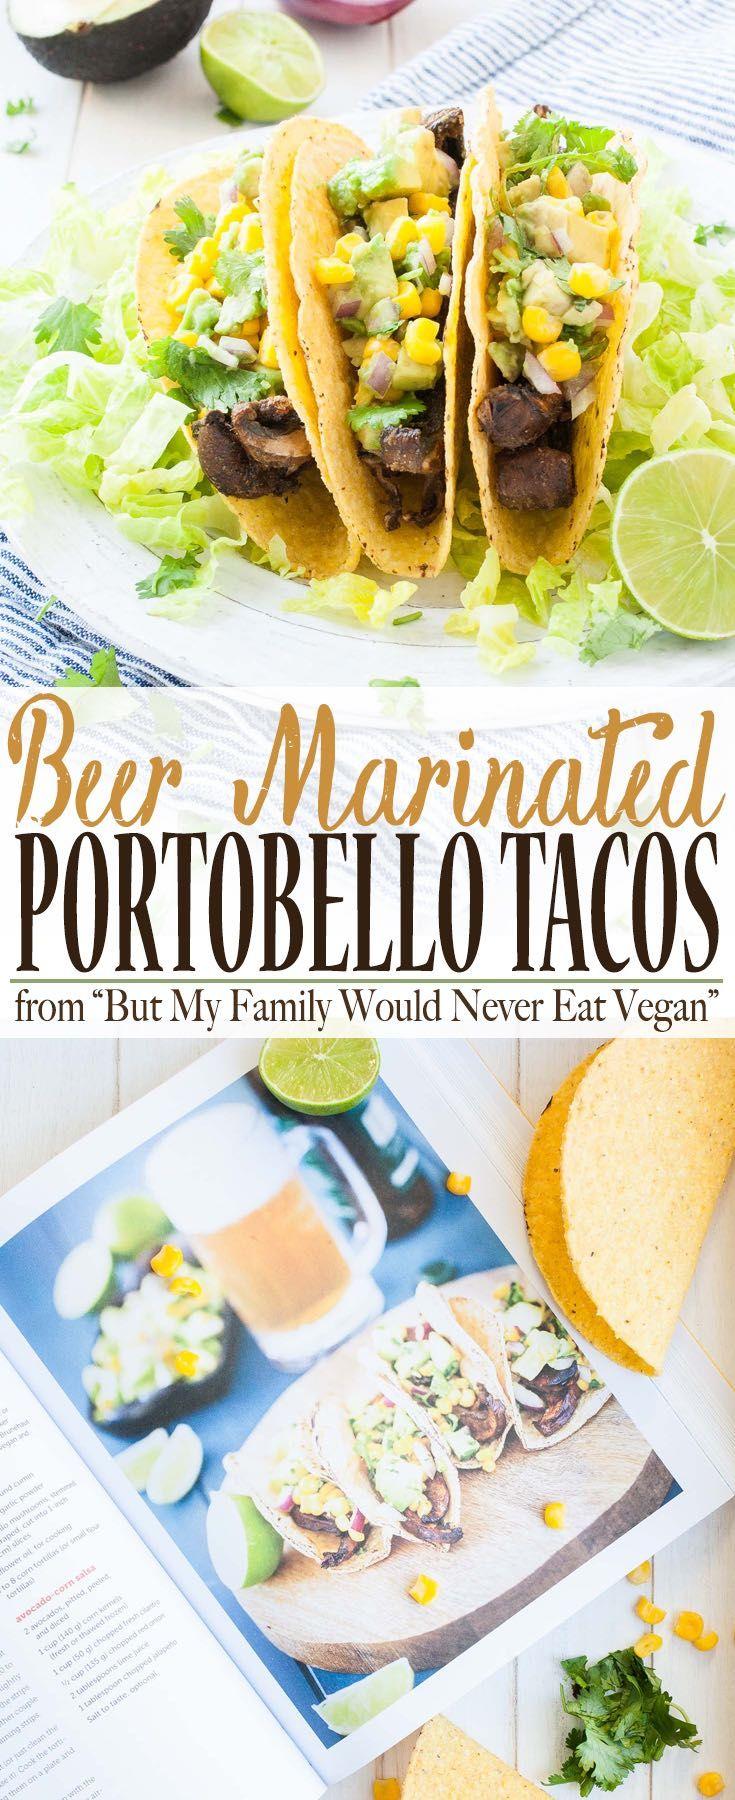 Beer-Marinated Portobello Mushroom Tacos